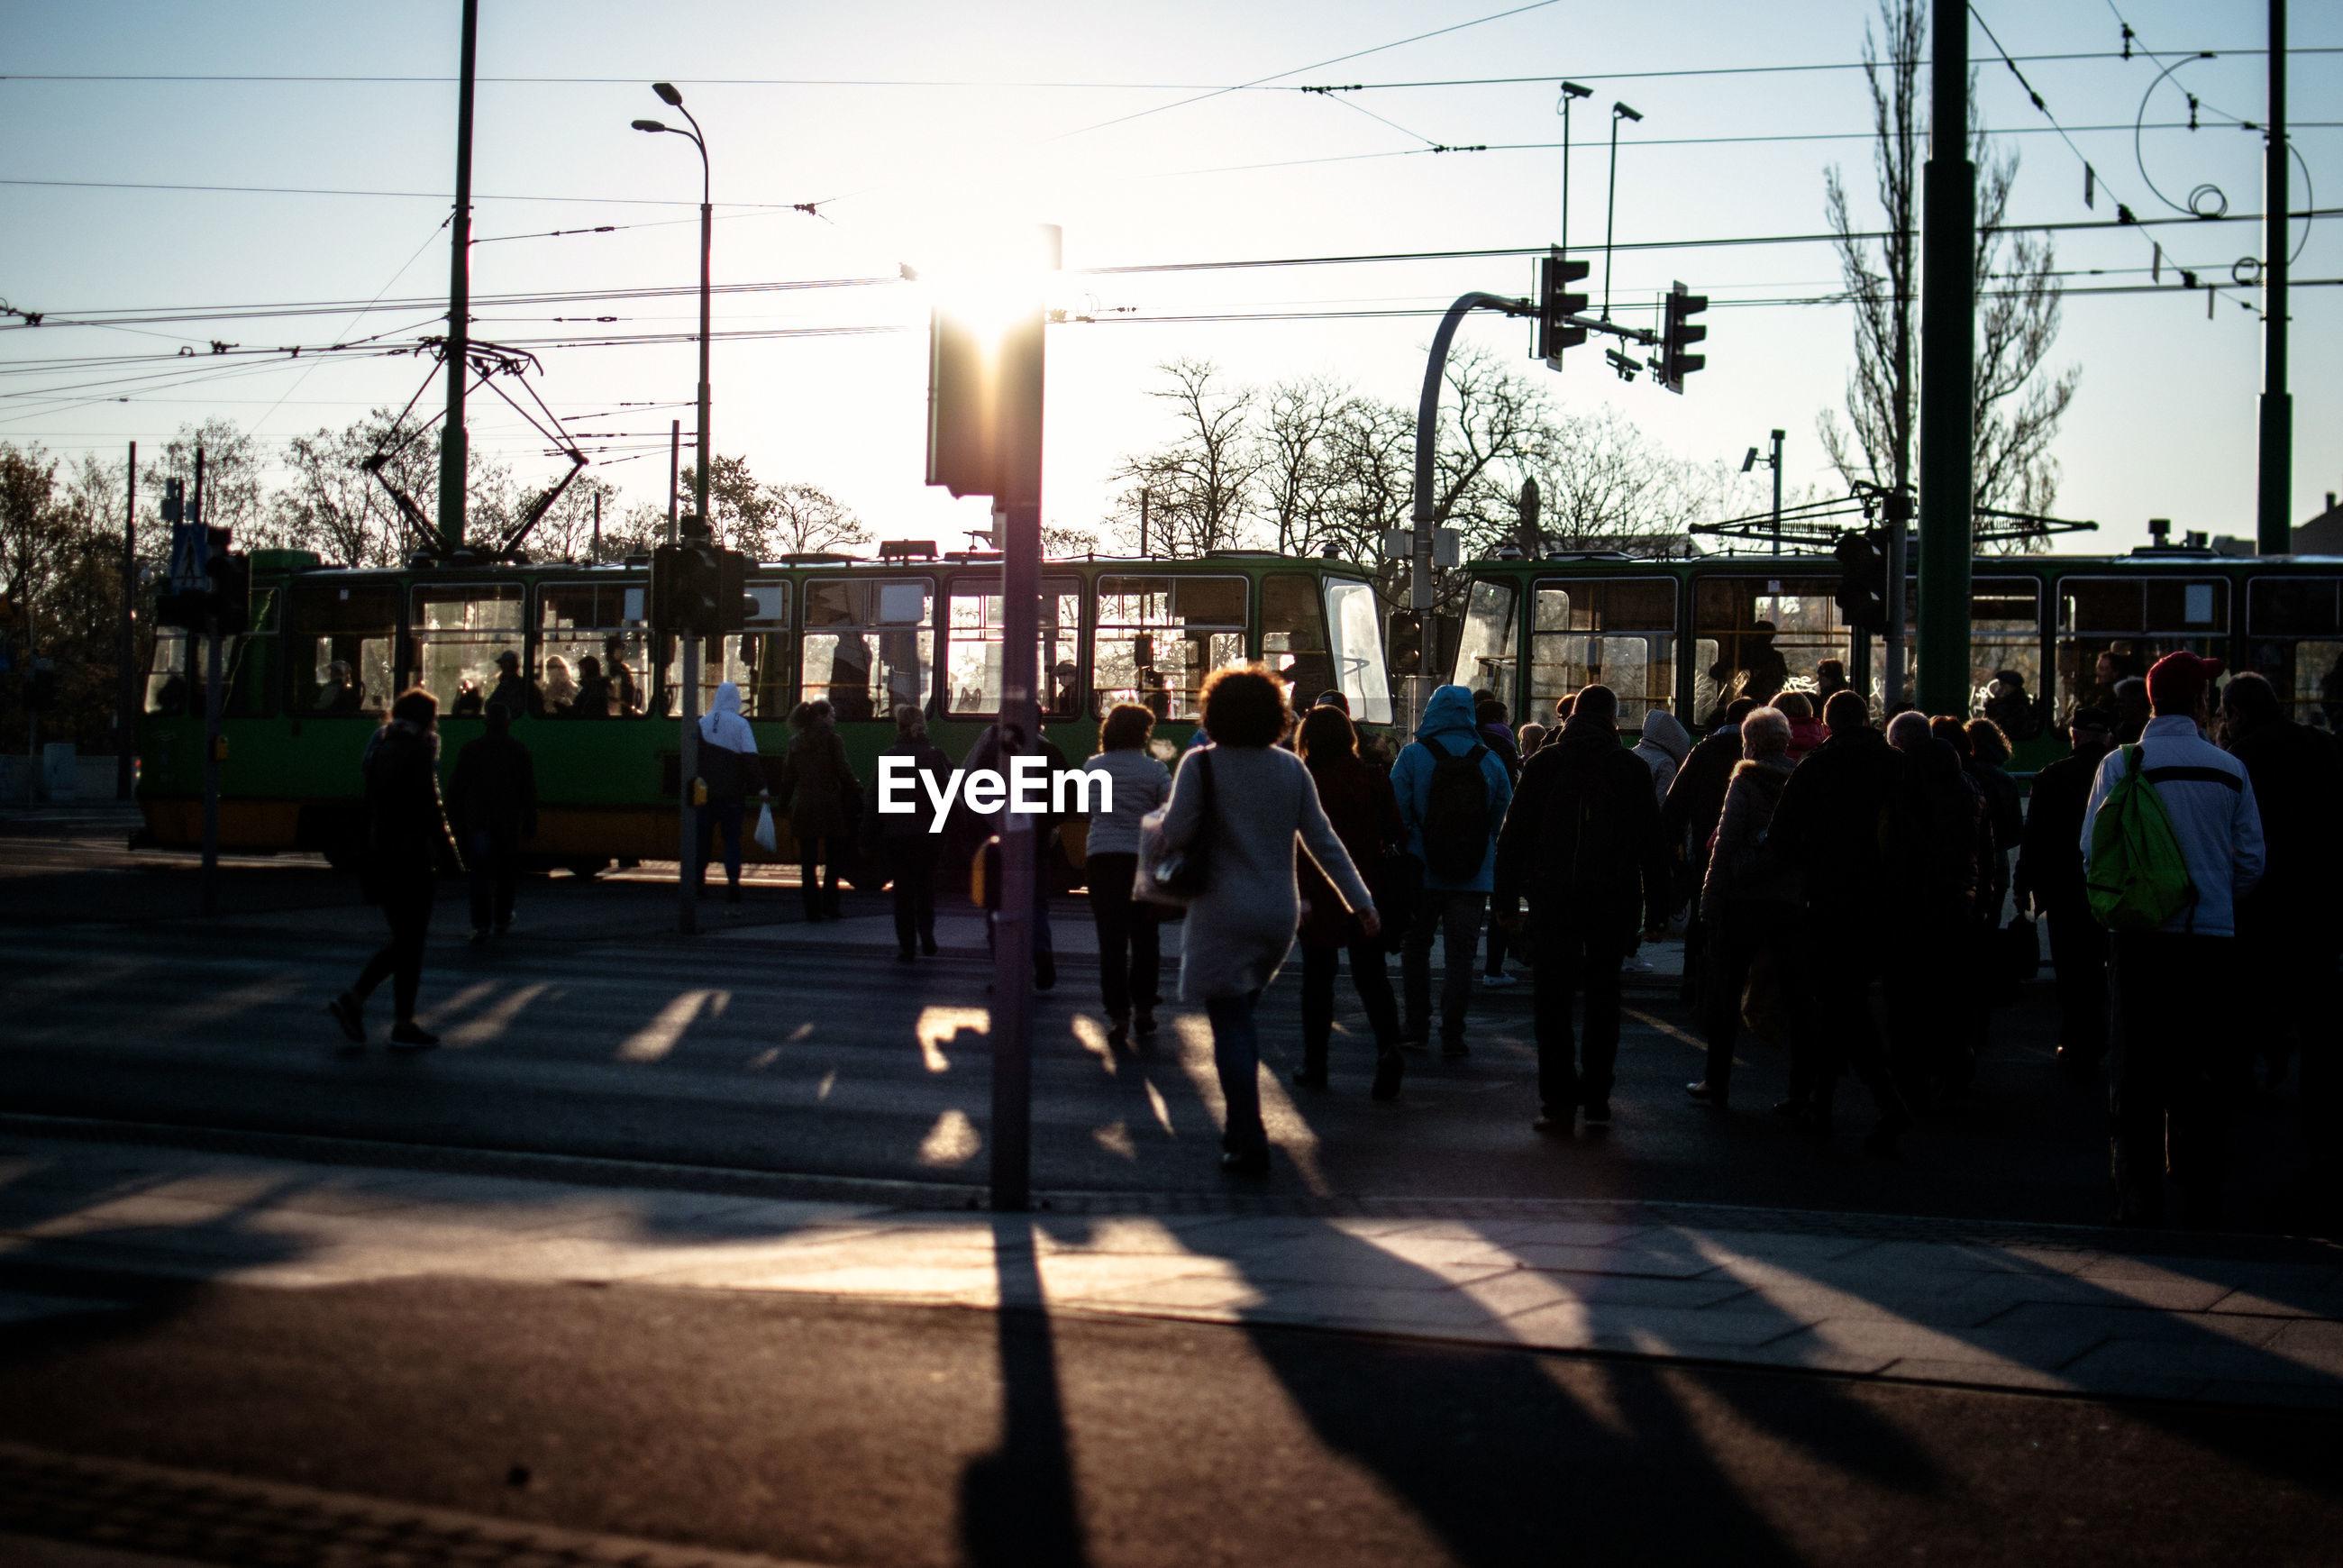 People crossing road by tram against clear sky